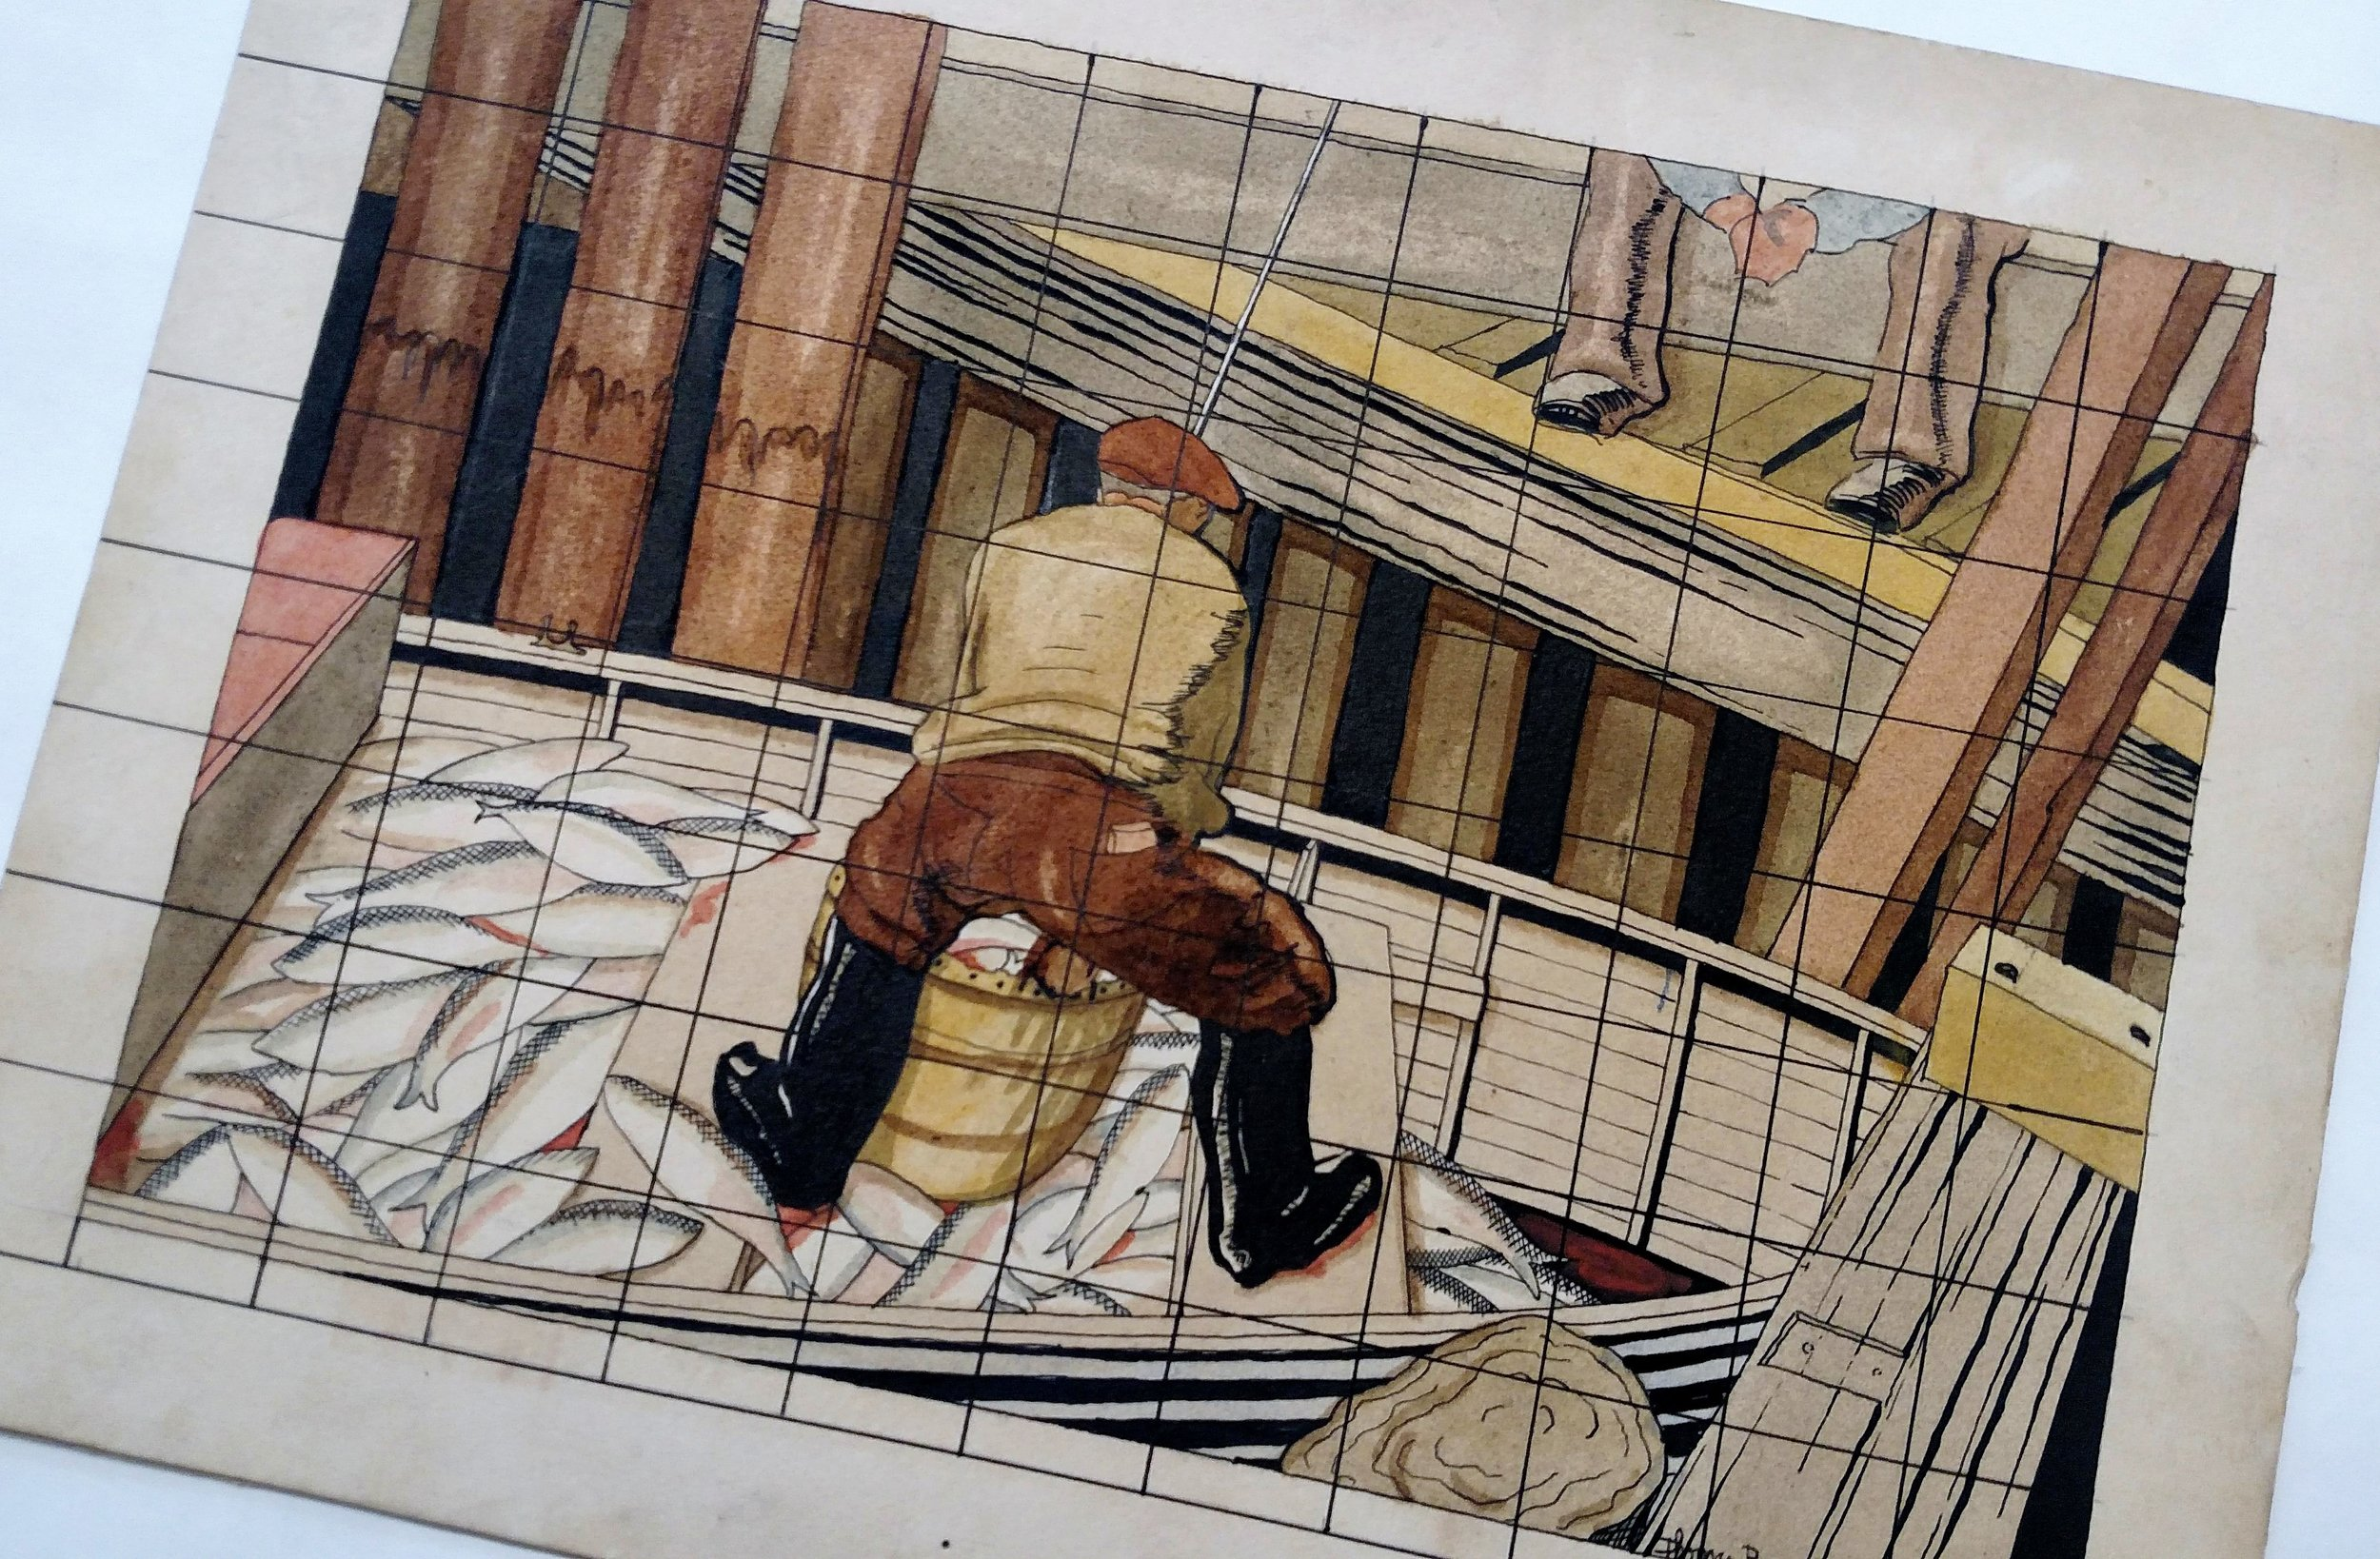 Mural Sketch, TWB, Jr.,ca 1930